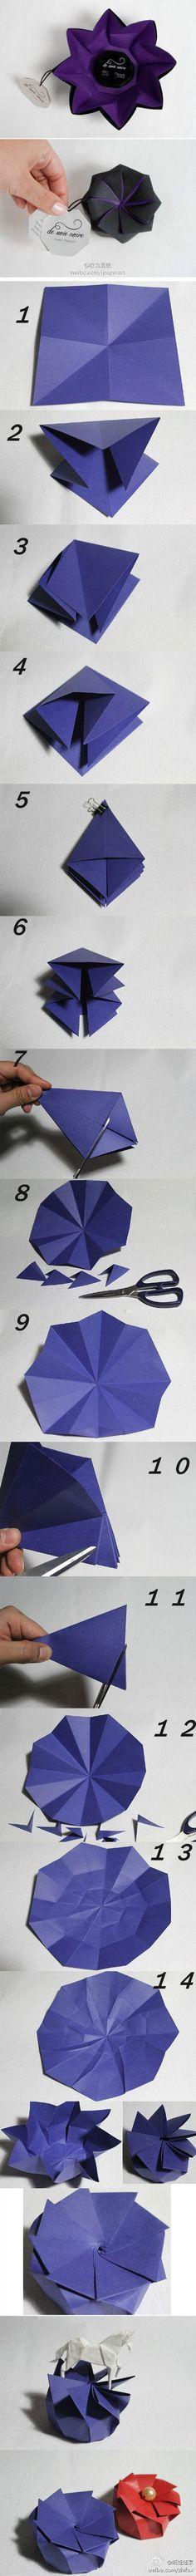 paper rose, origami flower box, diy crafts, paper flowers, craft tutorials, diy flower, paper crafts, diy paper, origami flowers